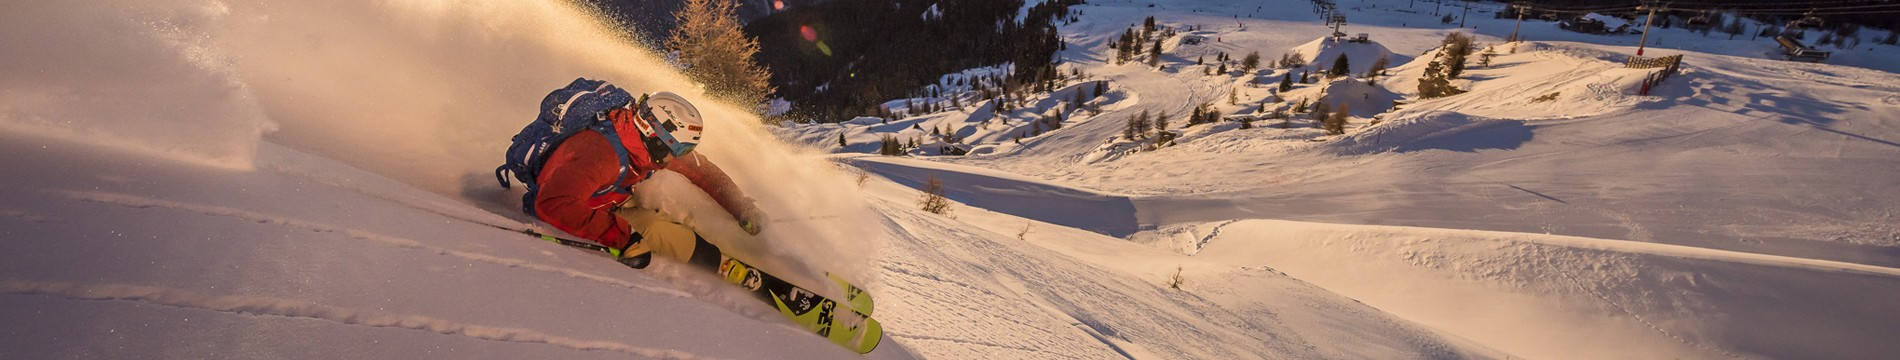 peisey-vallandry-hiver-ski-glisse-shu-6957